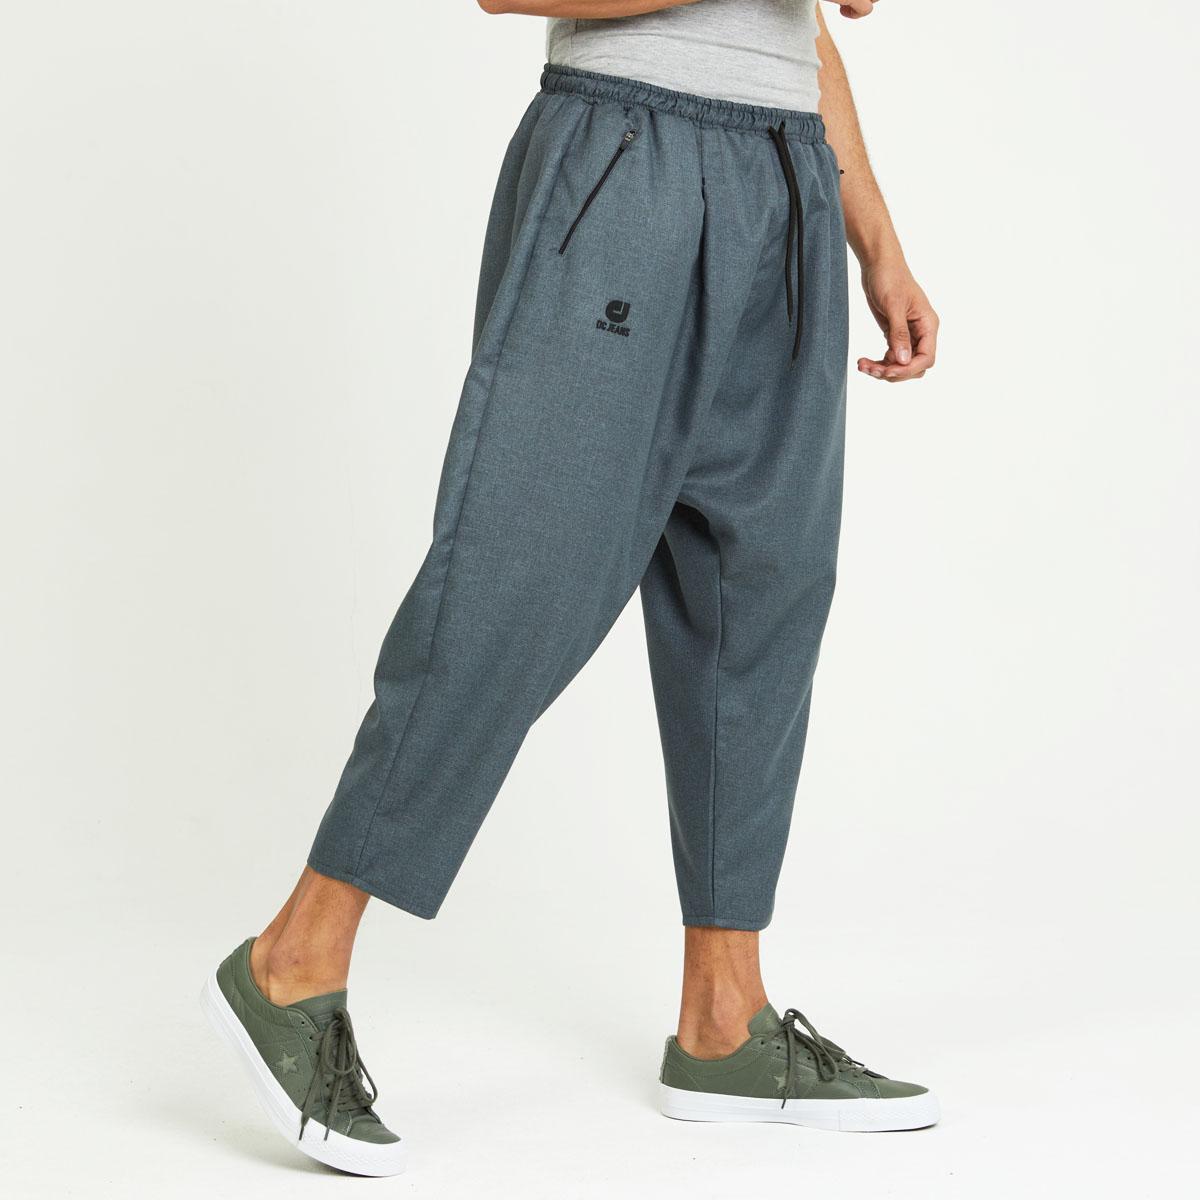 94f1f1ecf7cd5 Pantacourt Classic COS Gris - DCJeans ® - sarouel & clothing - site ...